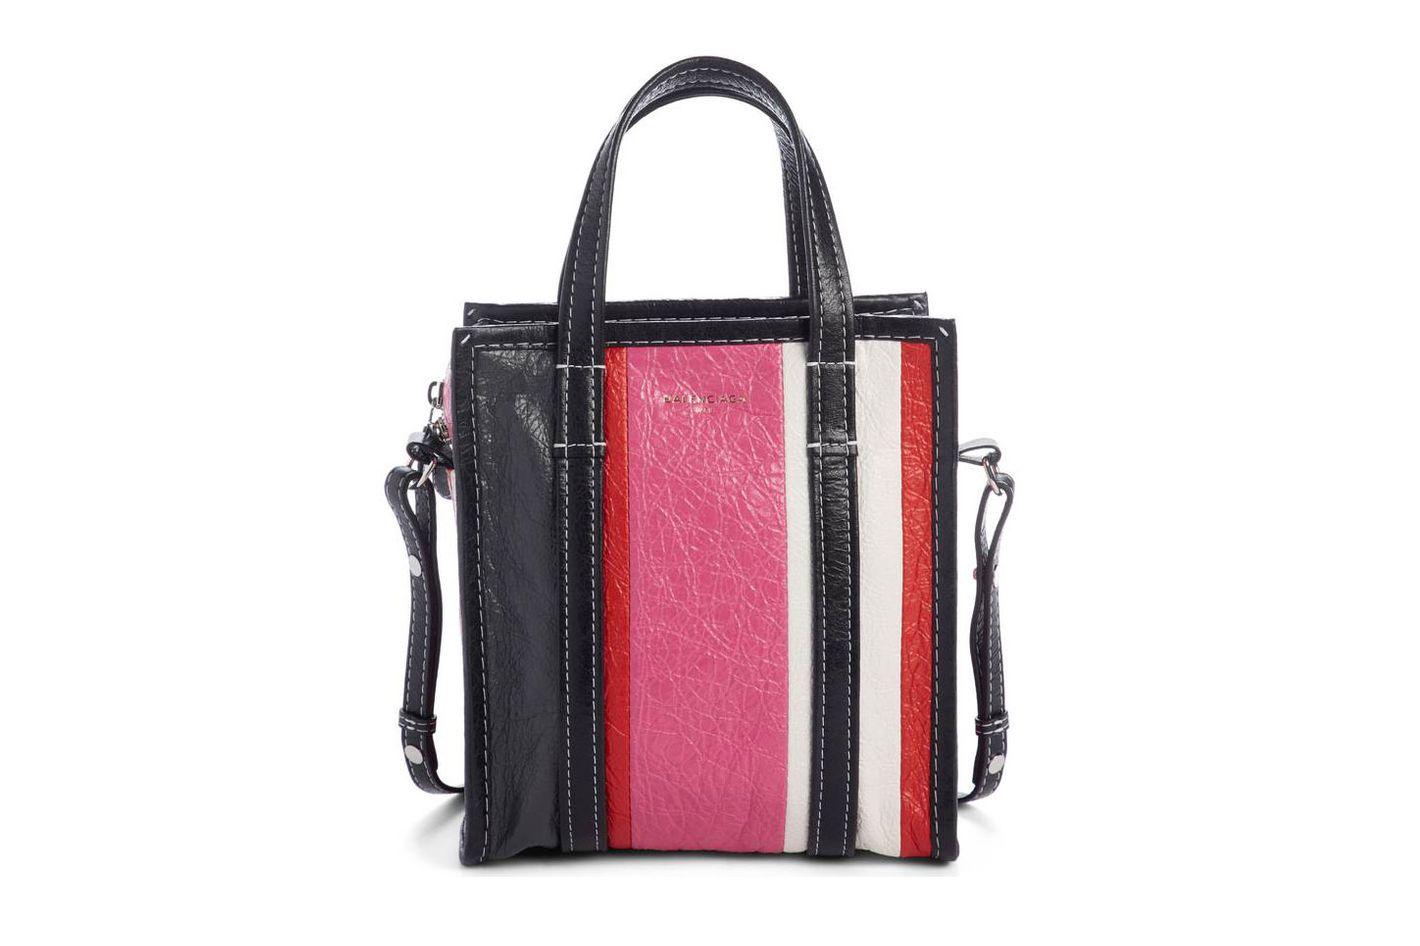 Balenciaga Extra Small Bazaar Leather Shopper at Nordstrom 6c214b983117d